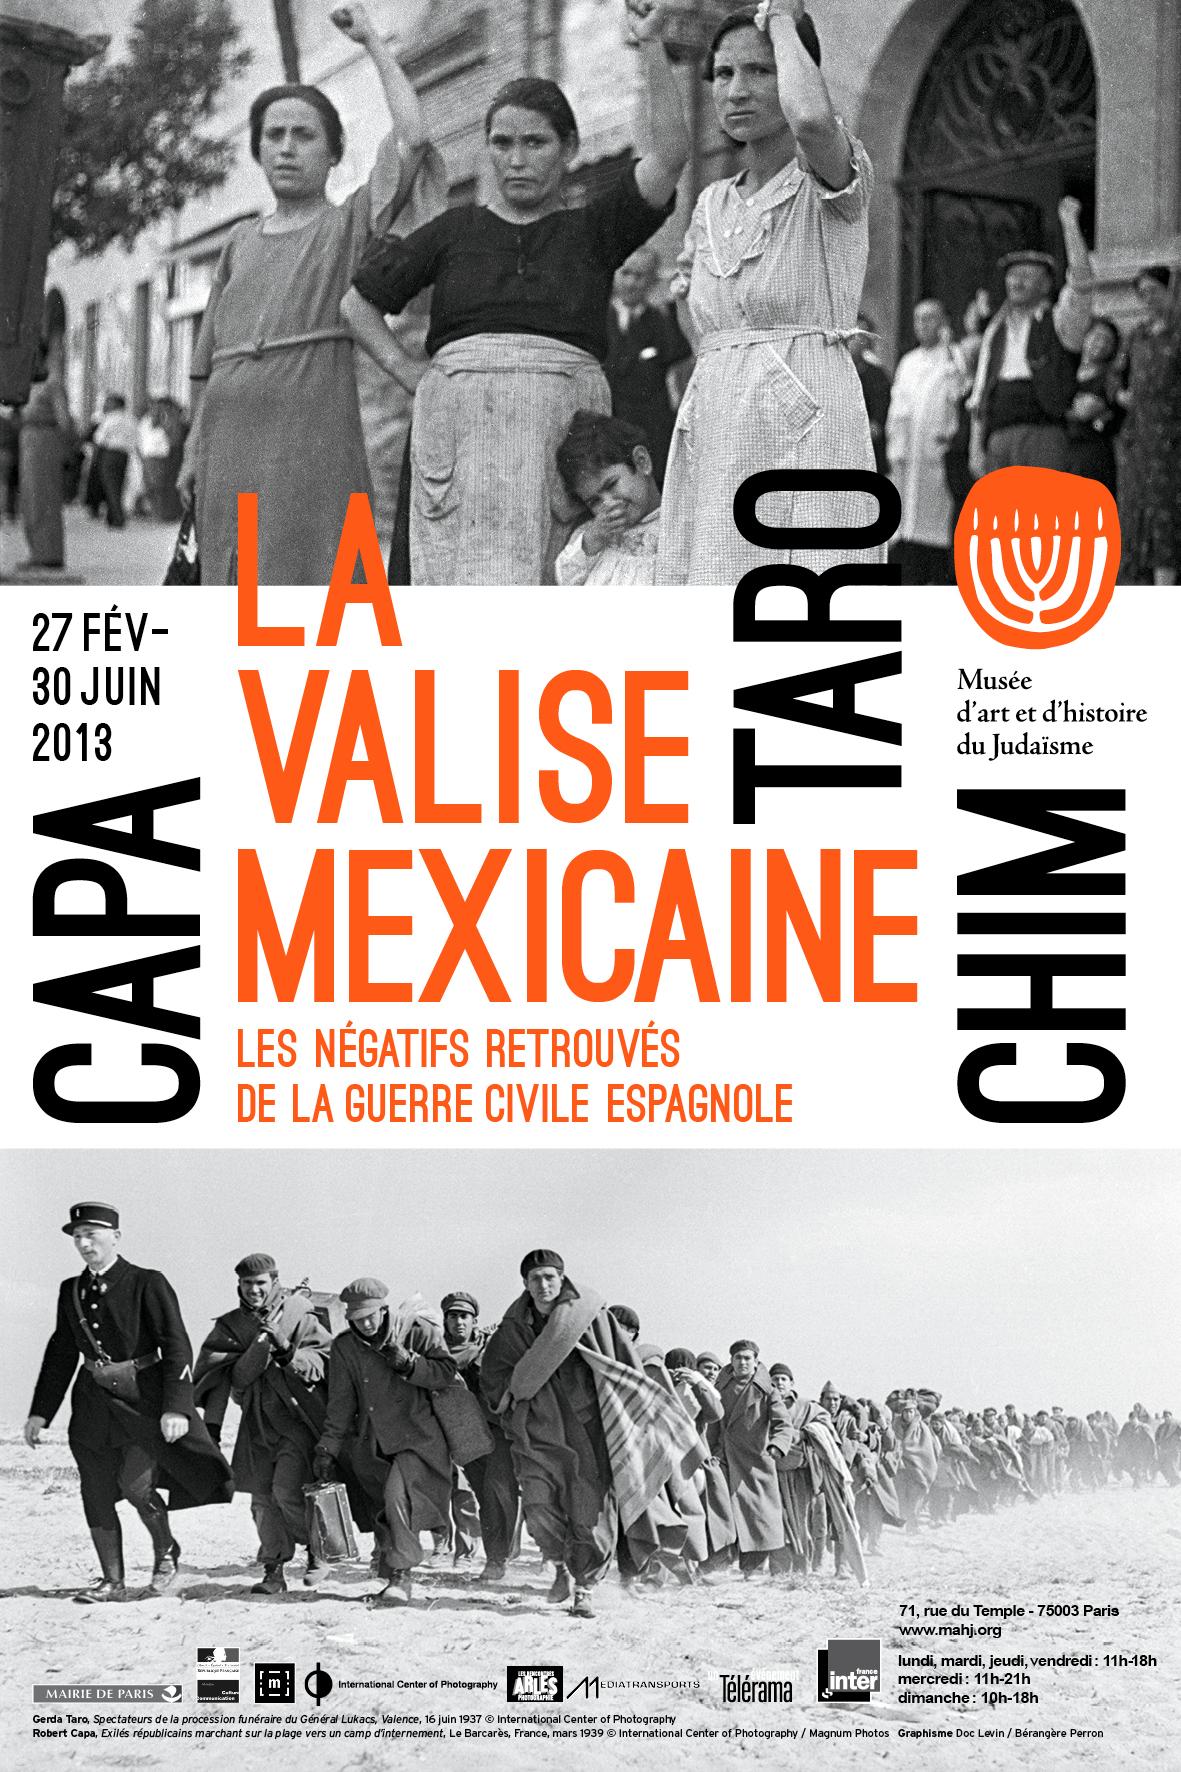 La valise mexicaine: Capa, Taro, Chim